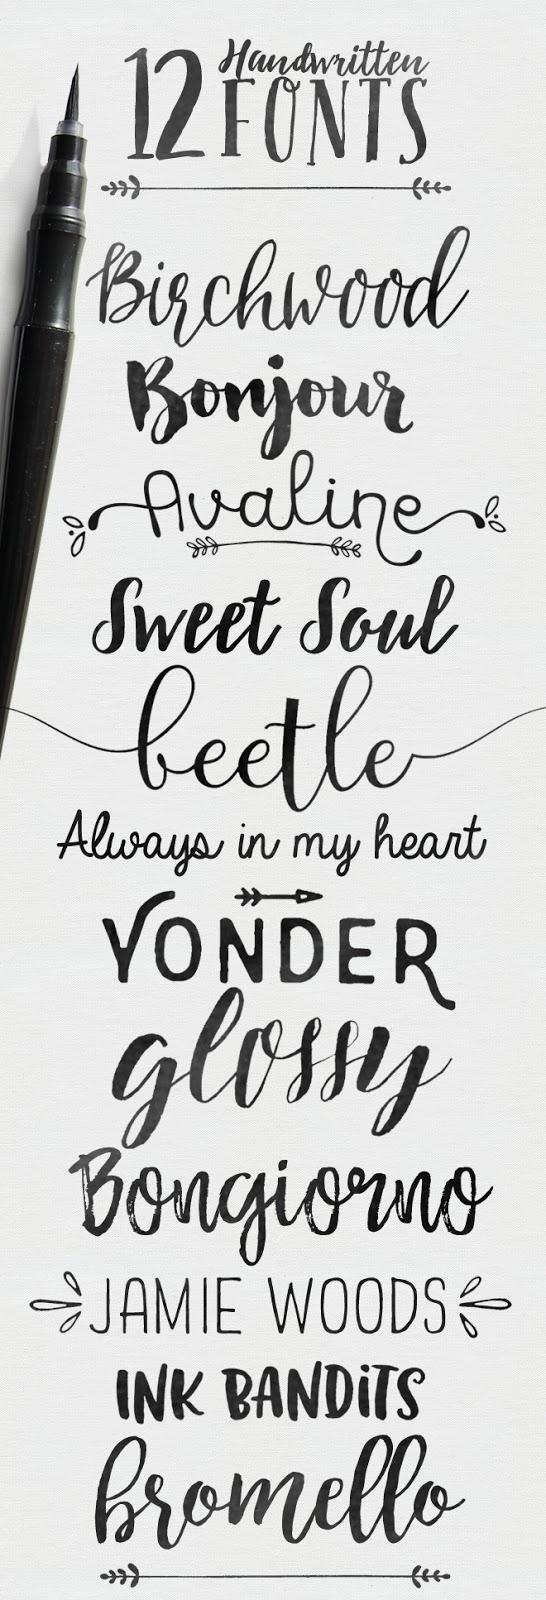 handwritten brush fonts, some free